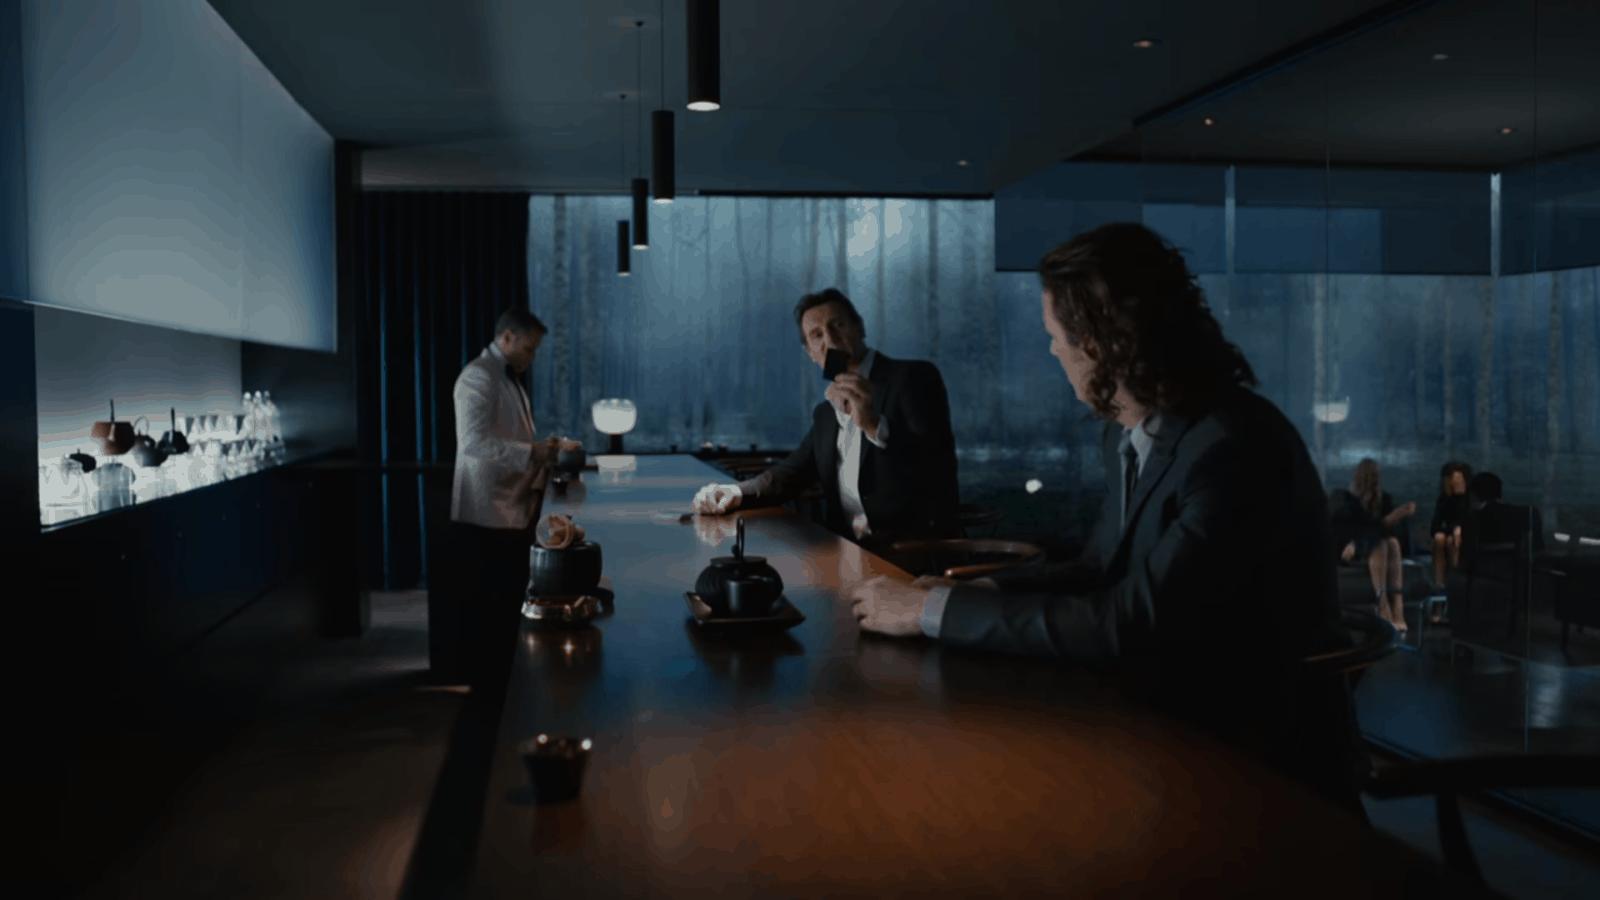 LG Super Bowl Commercial